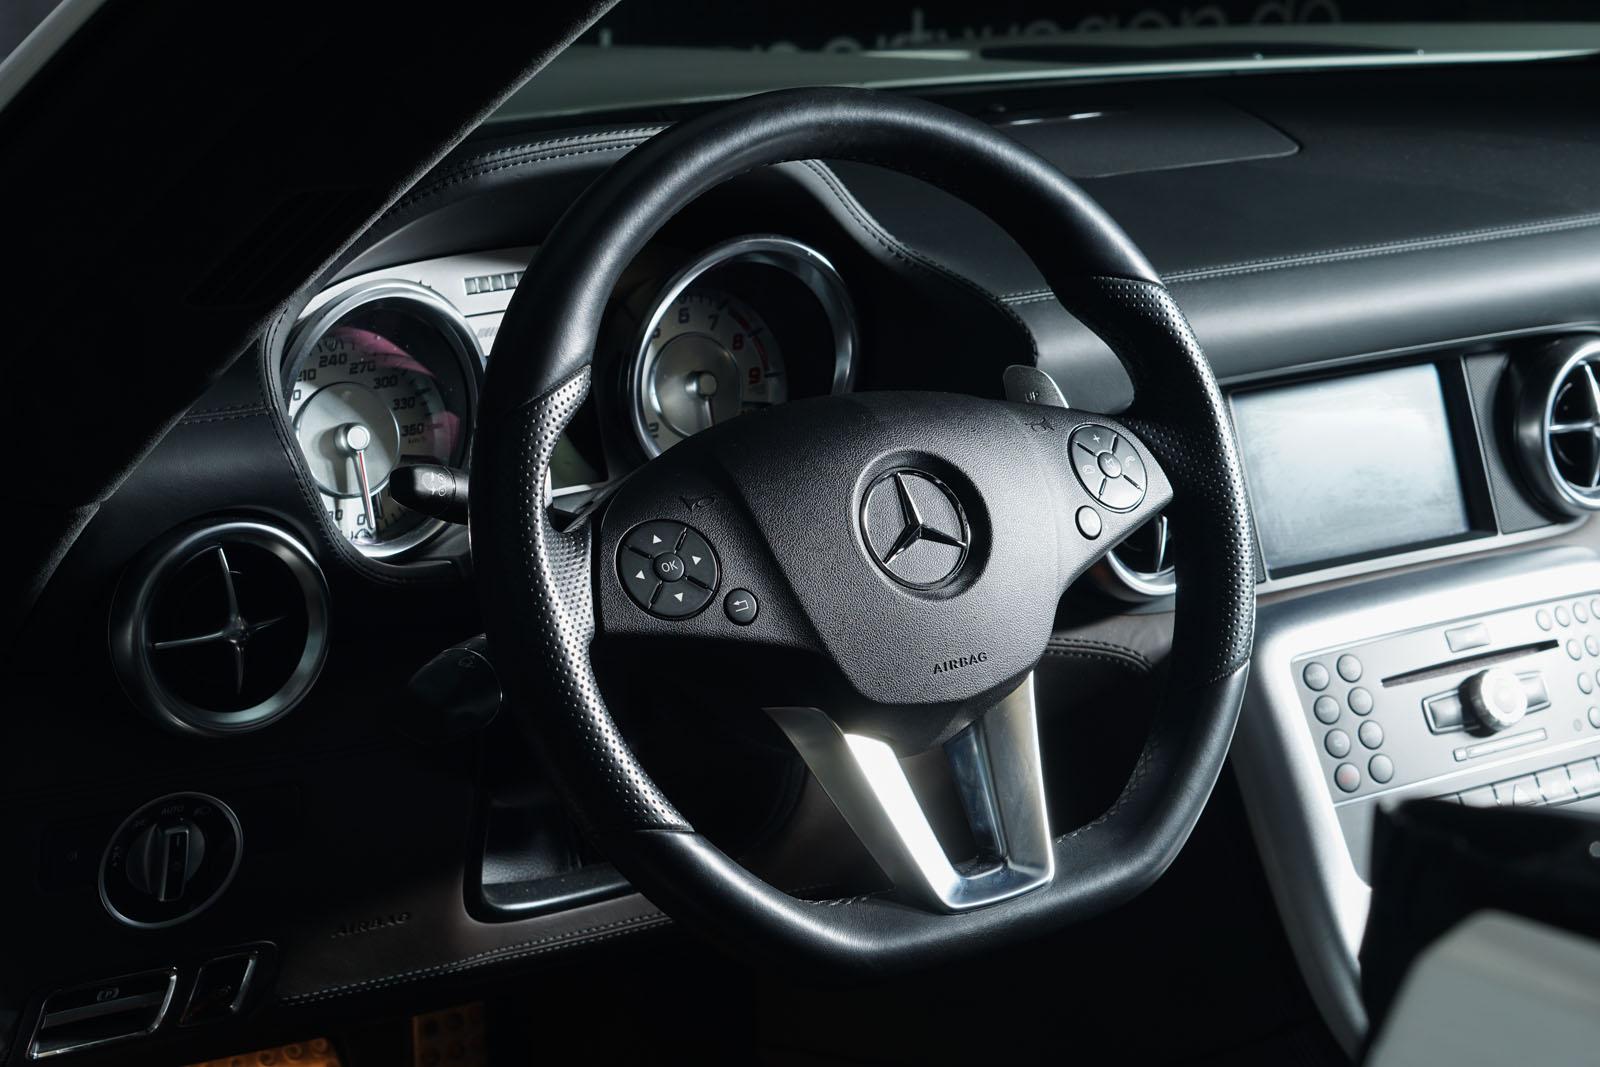 Mercedes-Benz_SLS_AMG_Roadster_Weiß_Braun_MB_7879_10_w